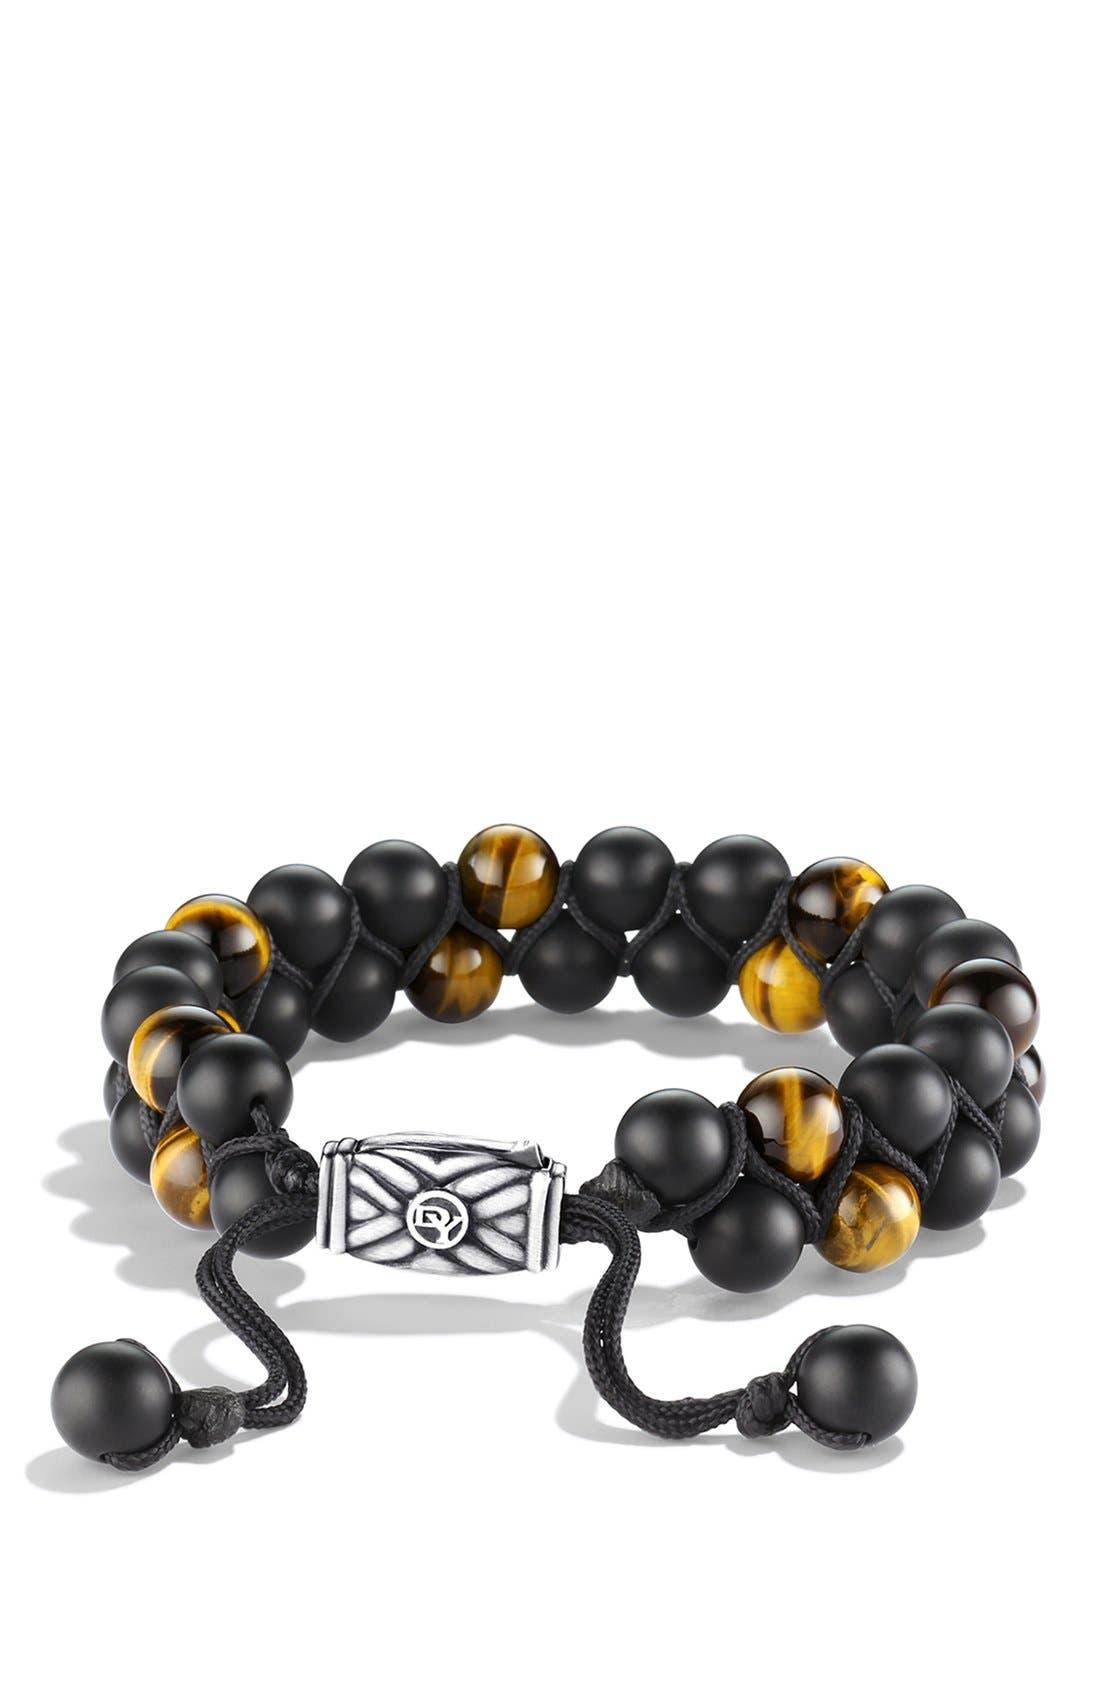 DAVID YURMAN Spiritual Beads Two-Row Stone Bracelet